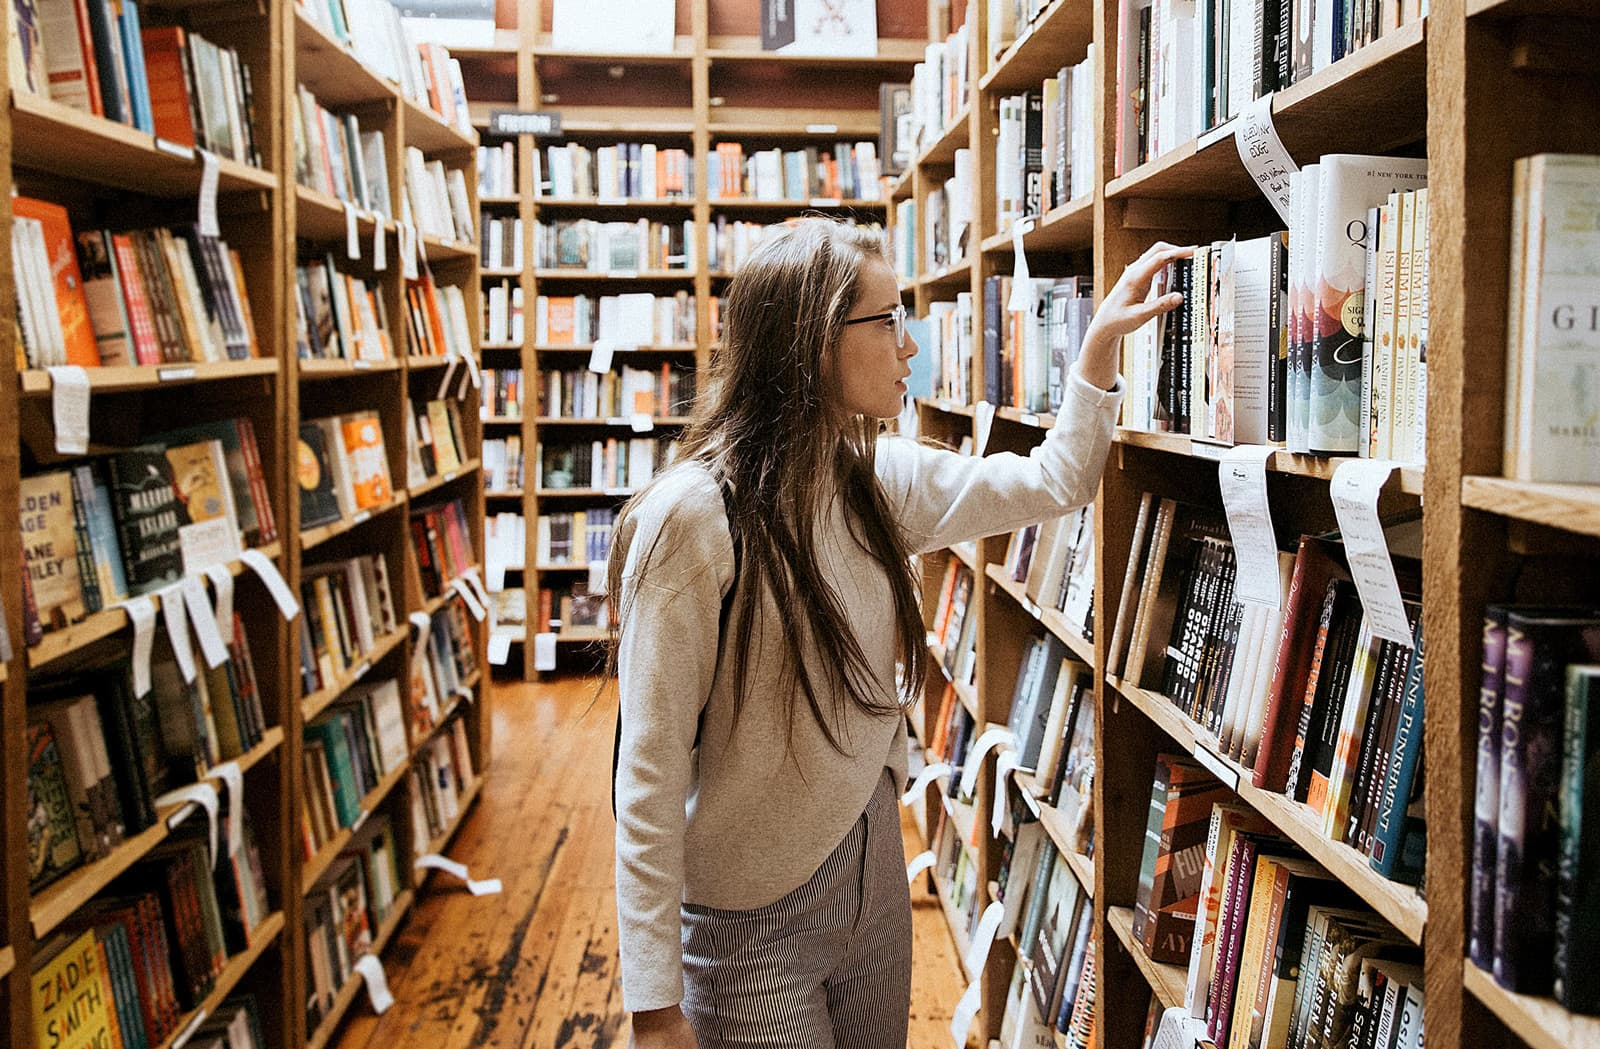 Biblioteca. Fotografia d'Unsplash. Becca Tapert